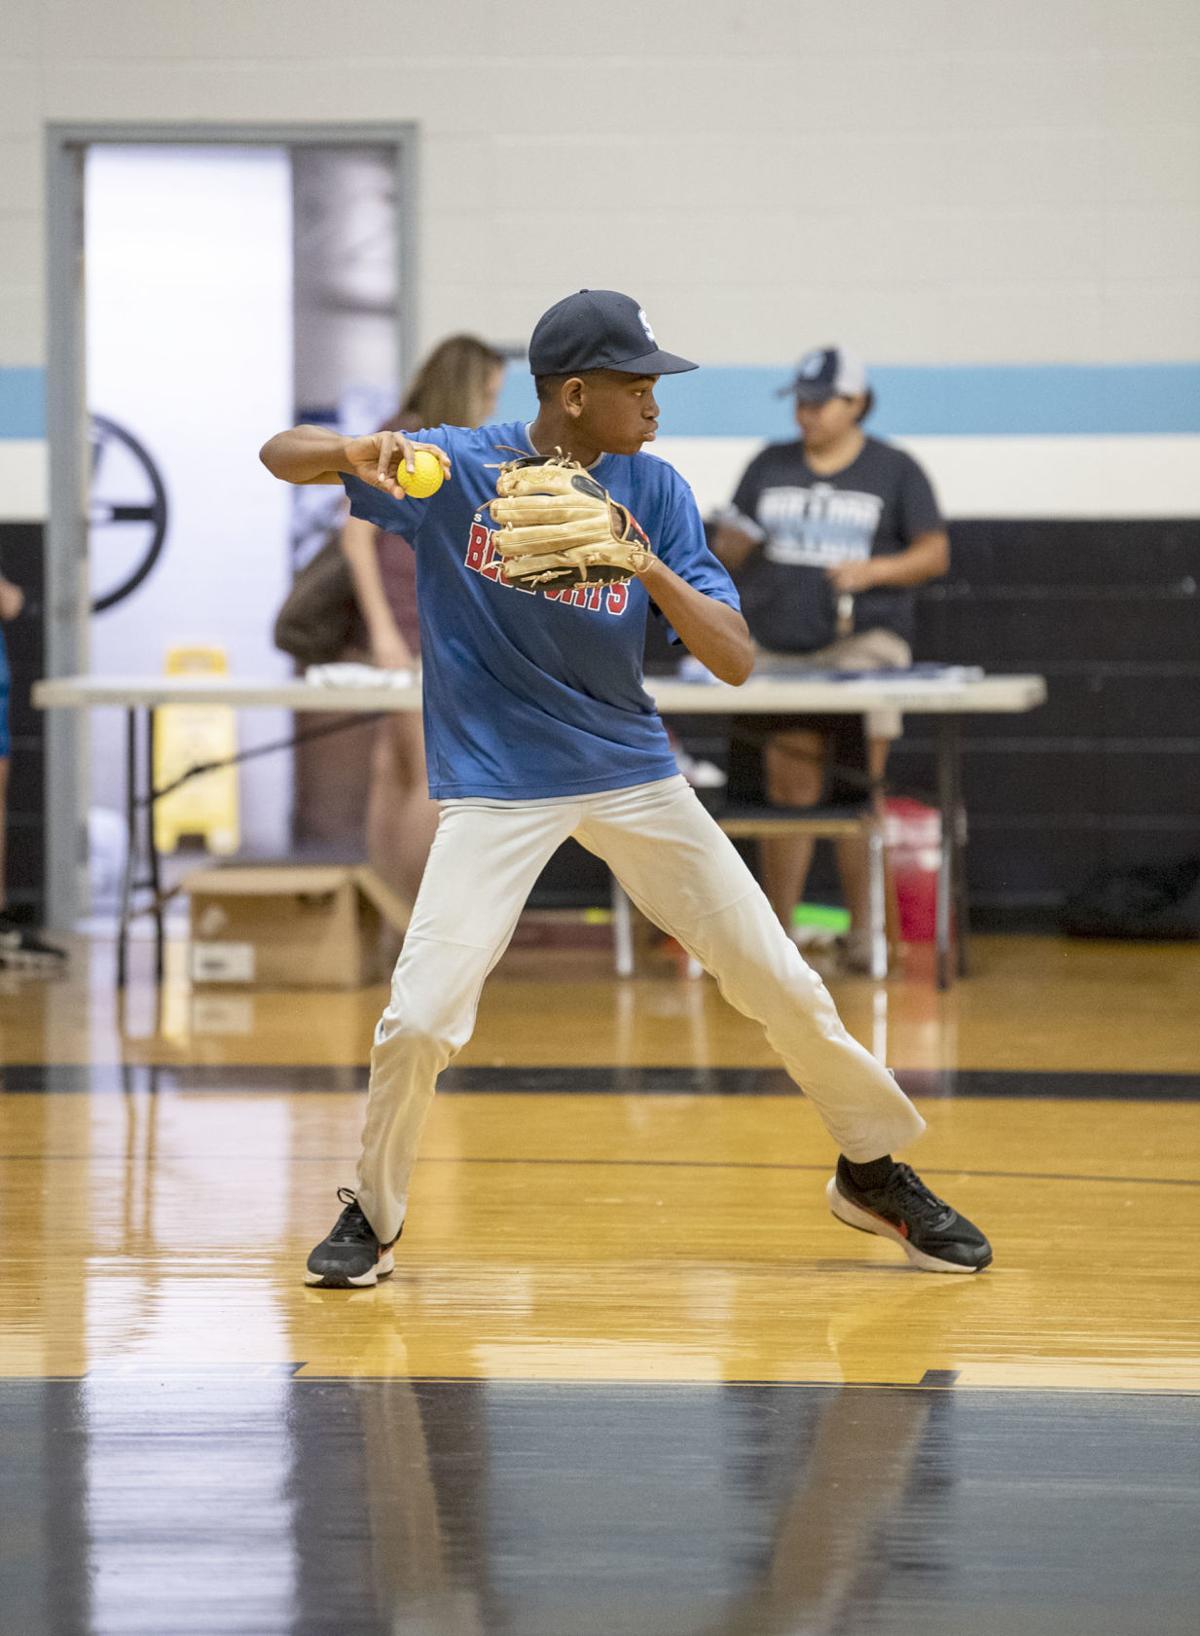 Sweeny youth baseball camp